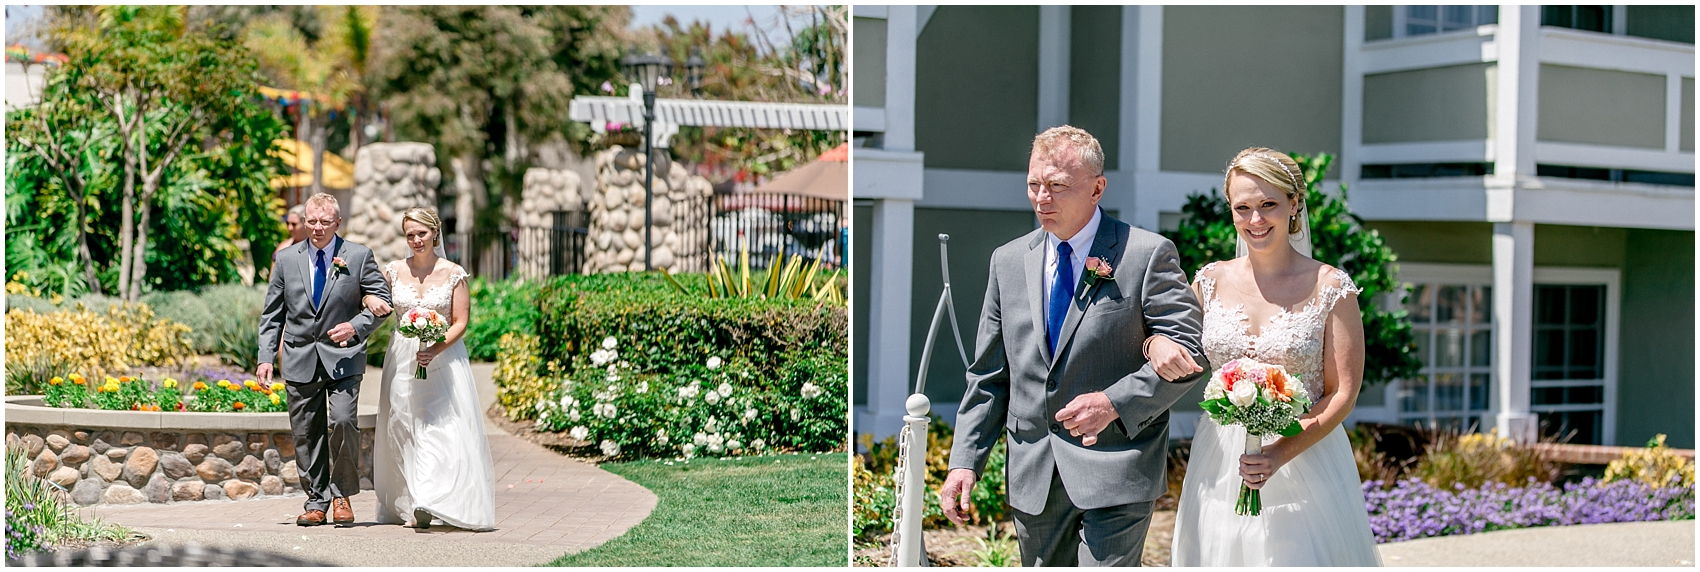 Jen and Mark's Wedding-0342.jpg